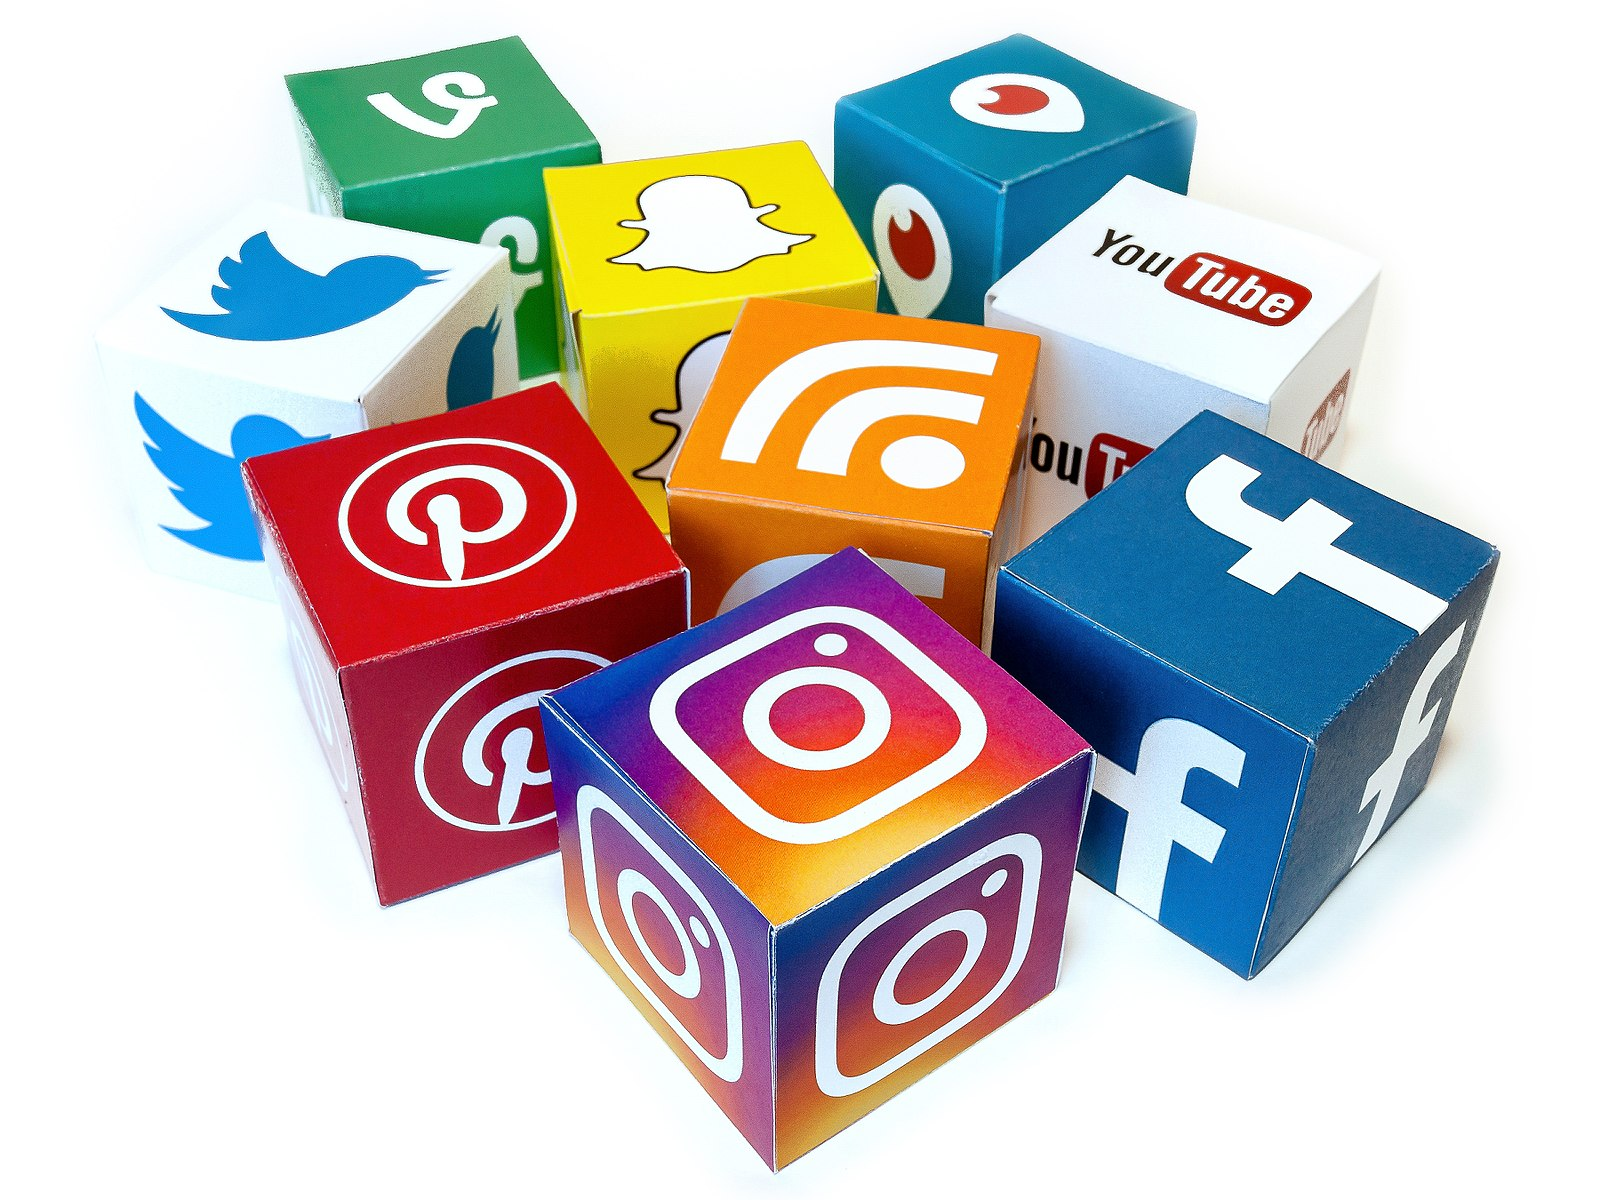 Social-Media-Cubes